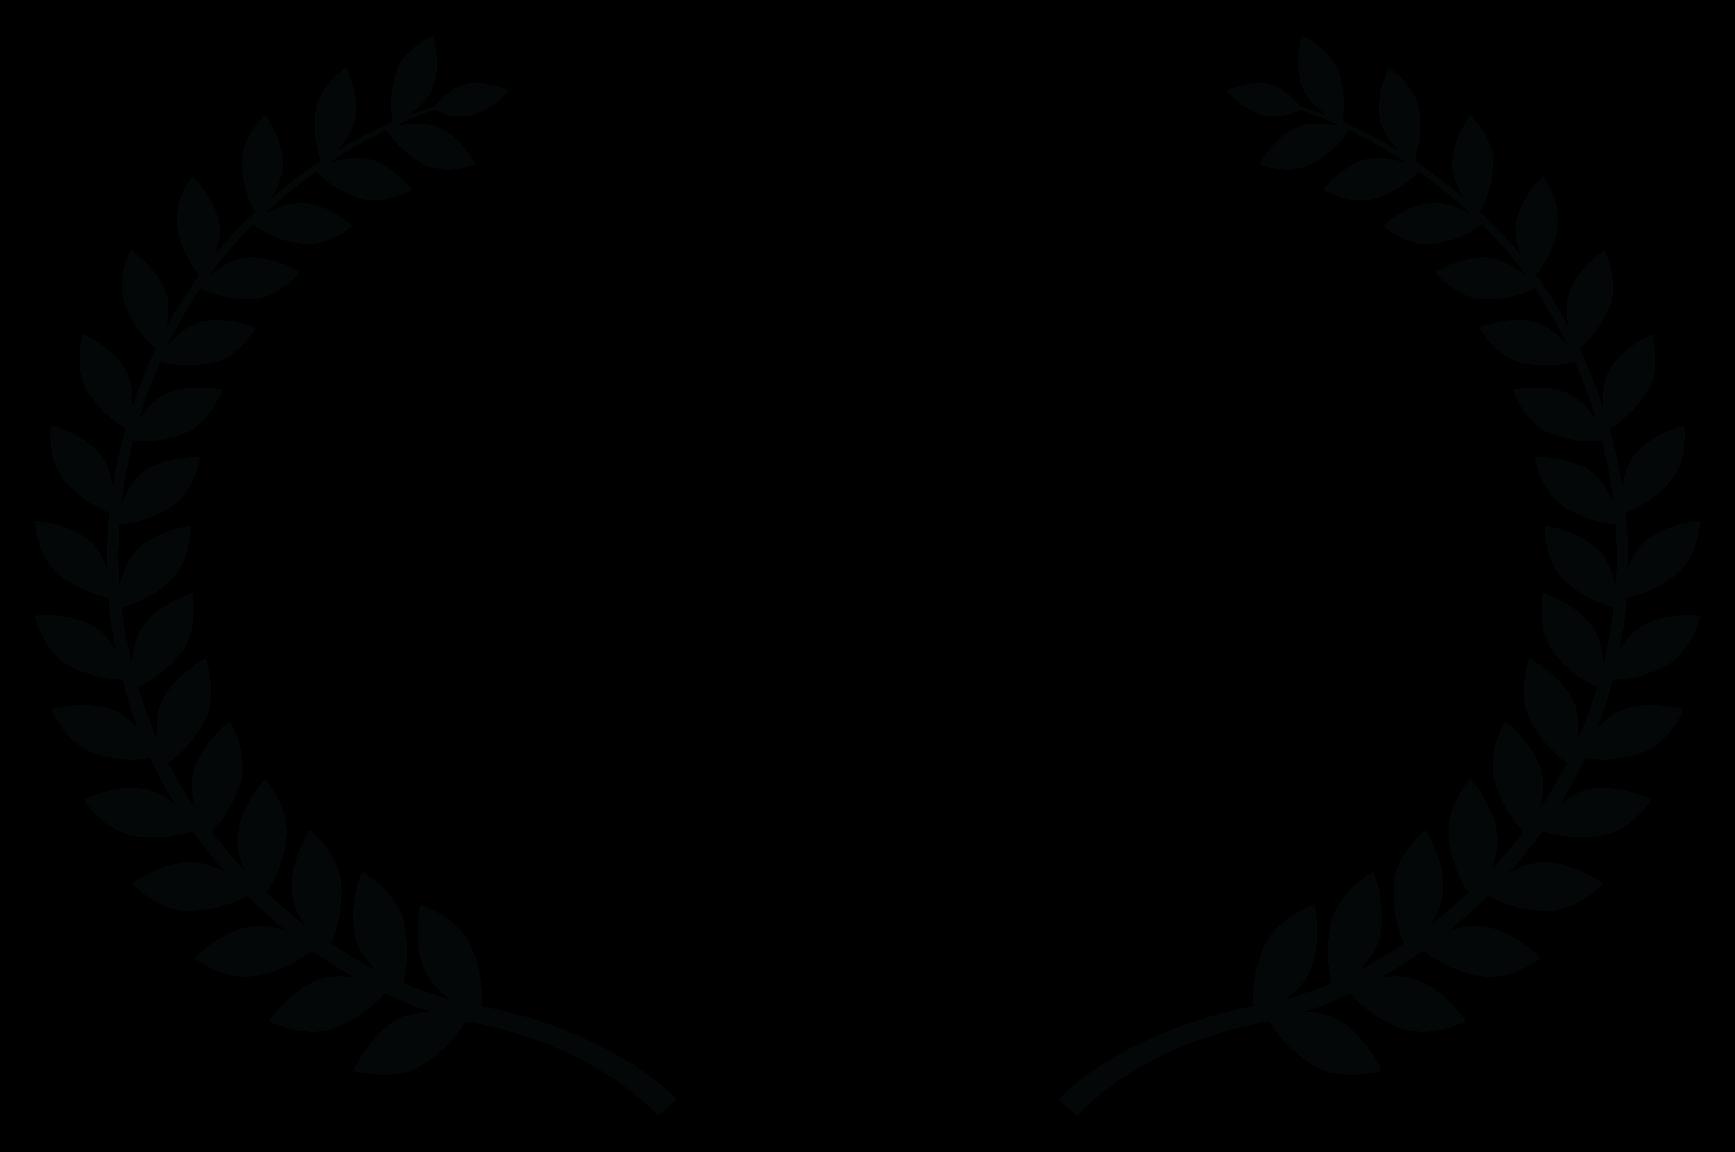 Donald E. Lacy Jr. Social Justice Award - Studio City International Film Festival - 2020